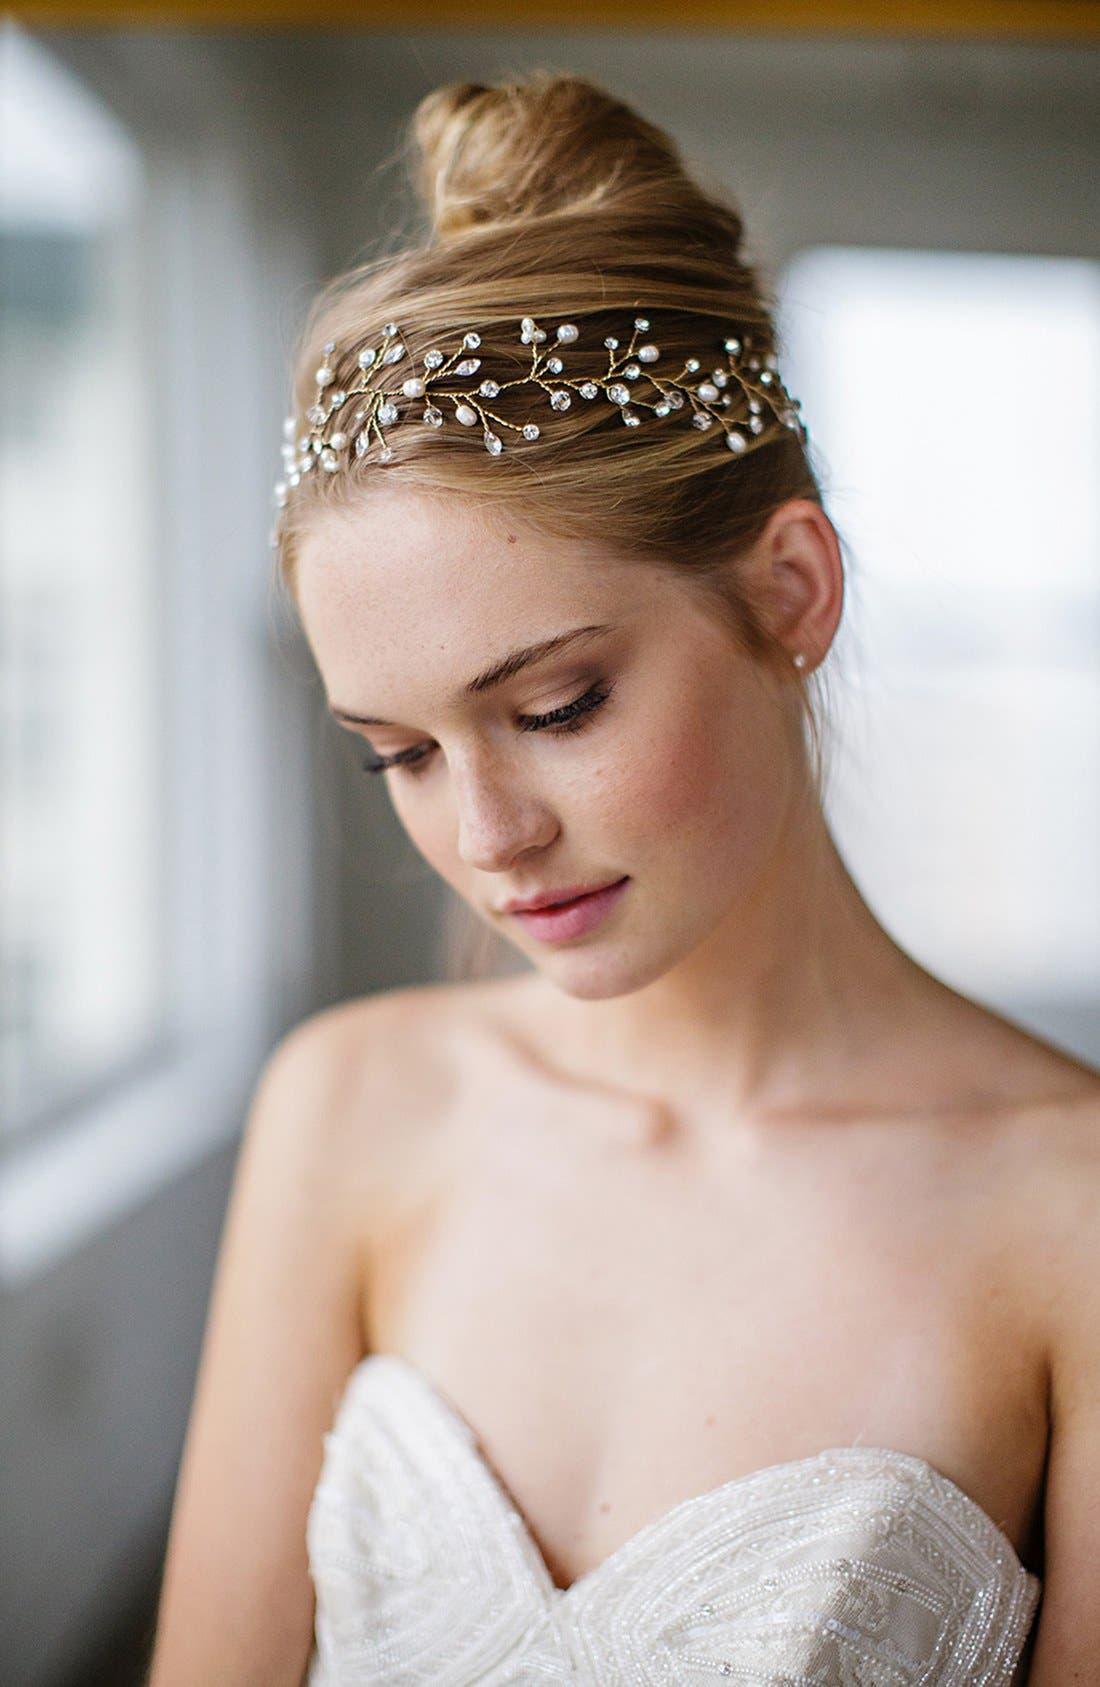 Alternate Image 1 Selected - Brides & Hairpins 'Vitalia' Pearl & Jeweled Head Band